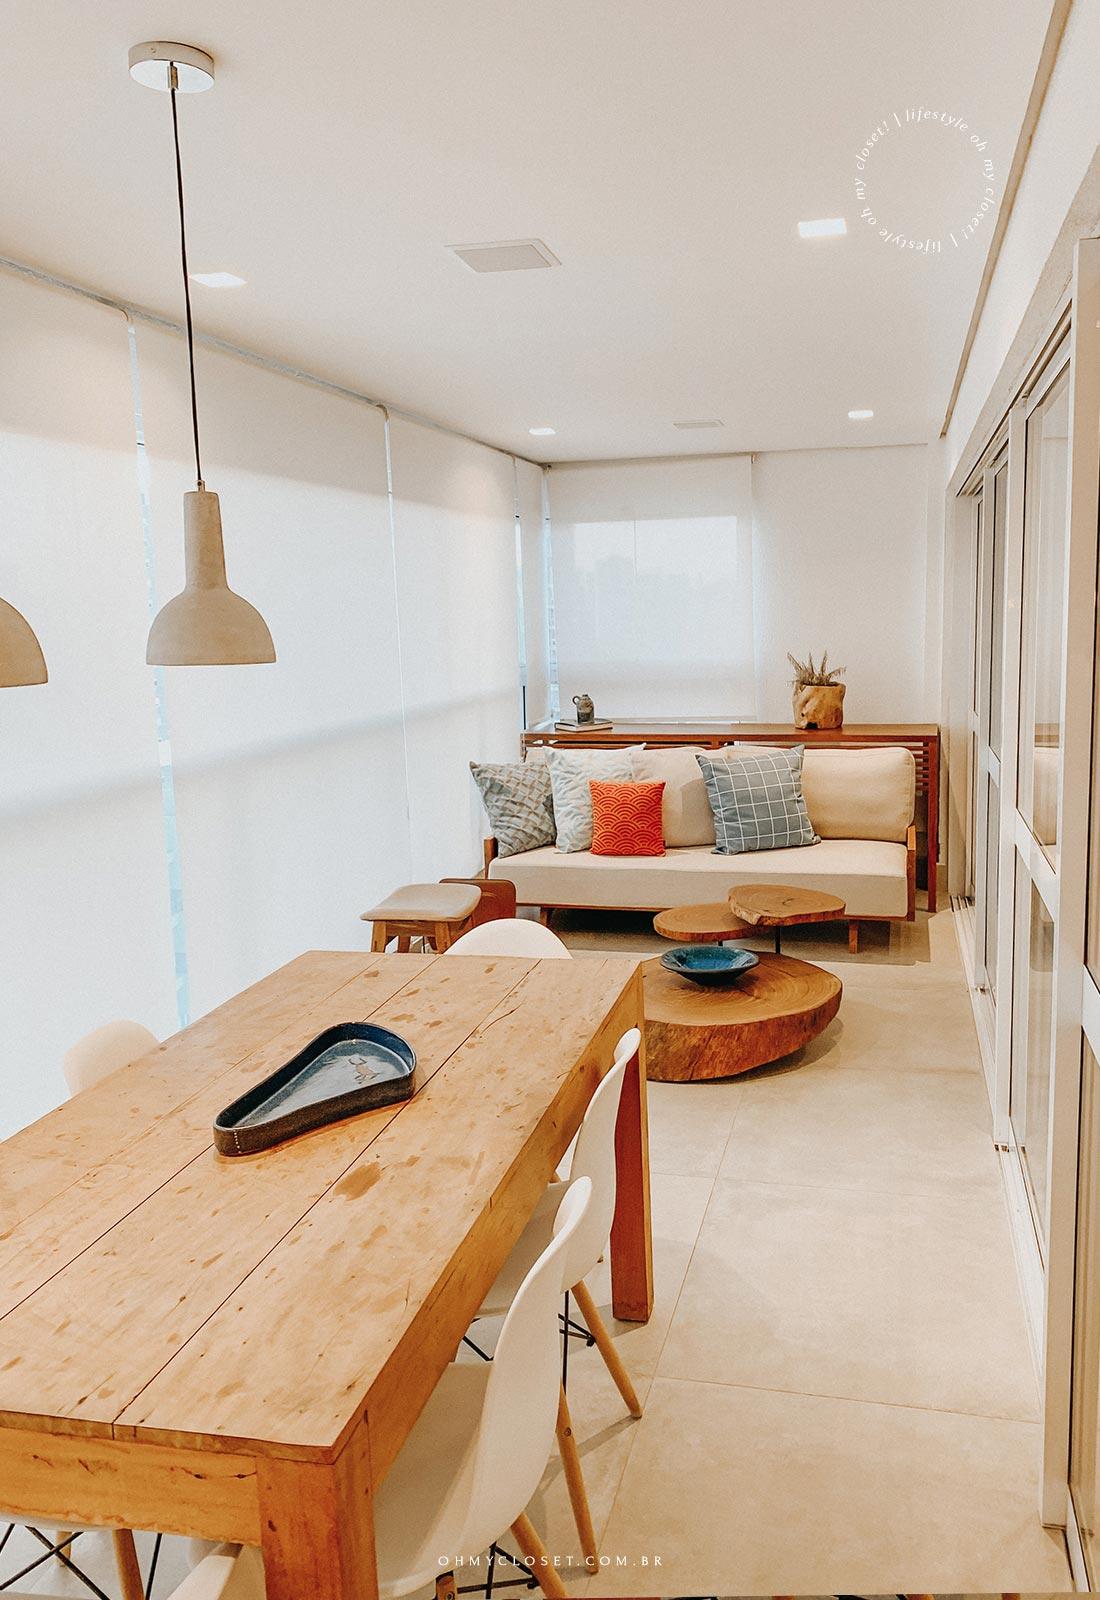 Sofá e mesa de jantar, 18 andar, apartamento DNA Pinheiros.